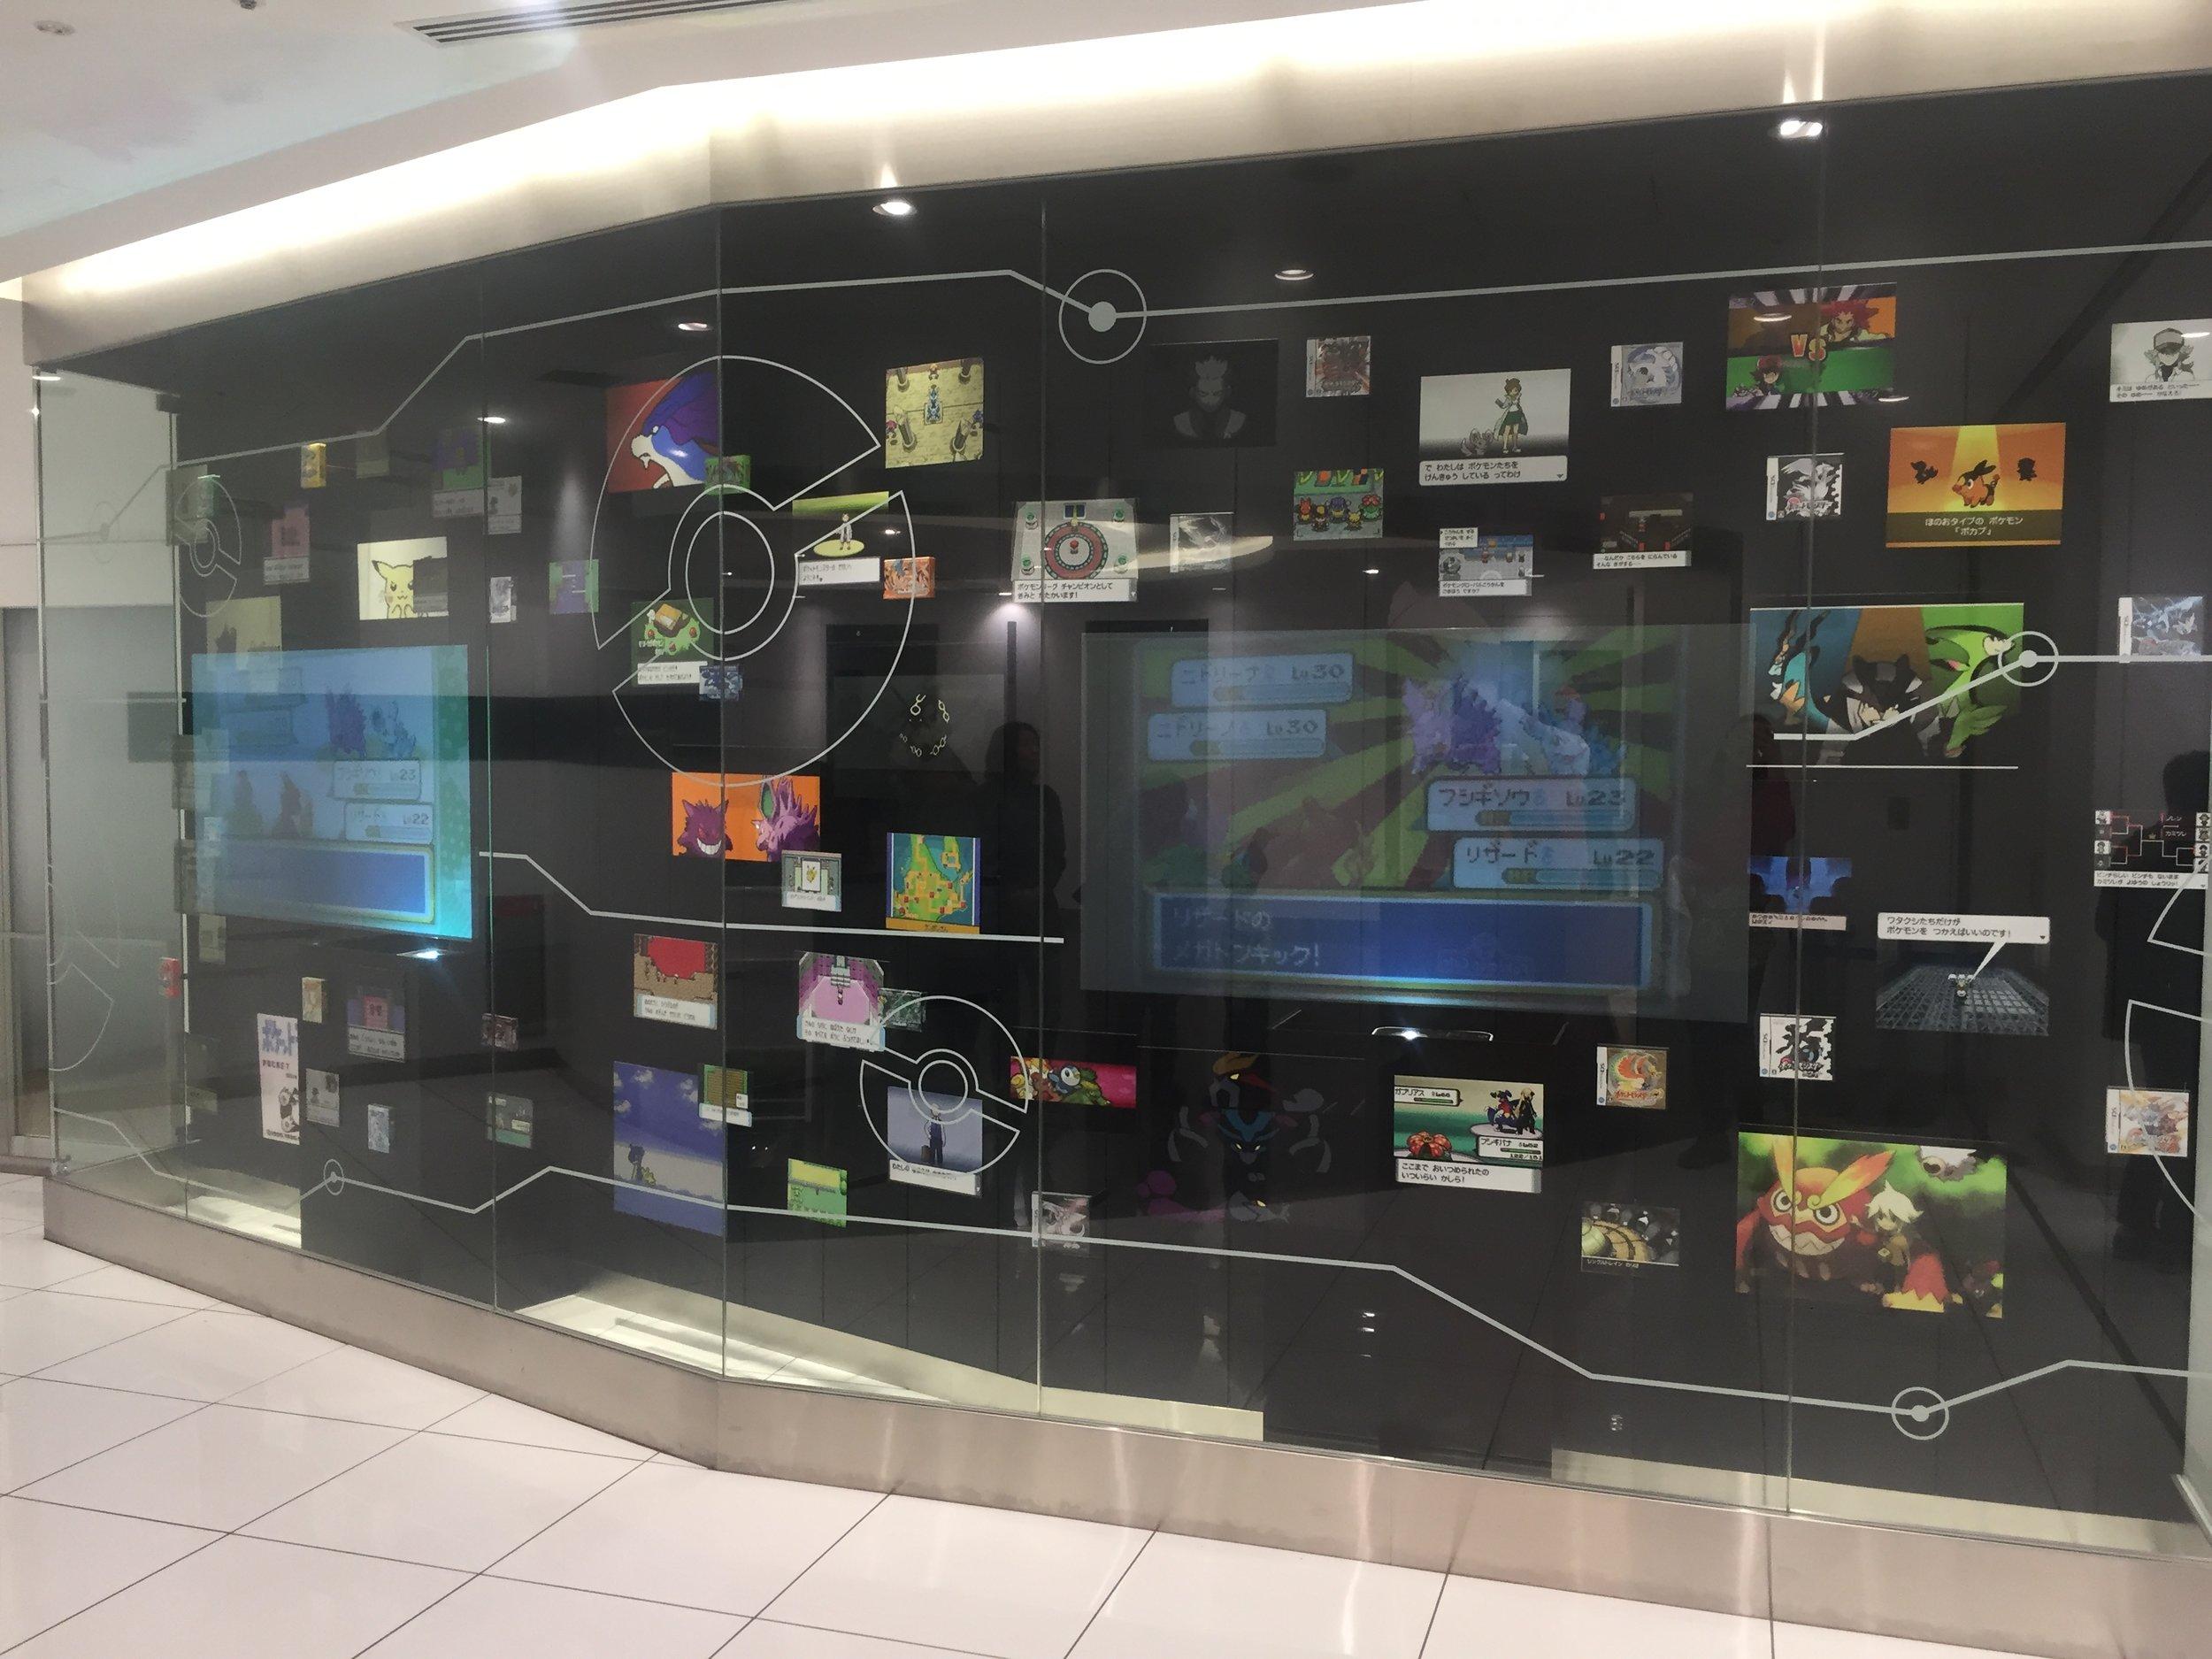 pokemon center display of pokemon history.JPG